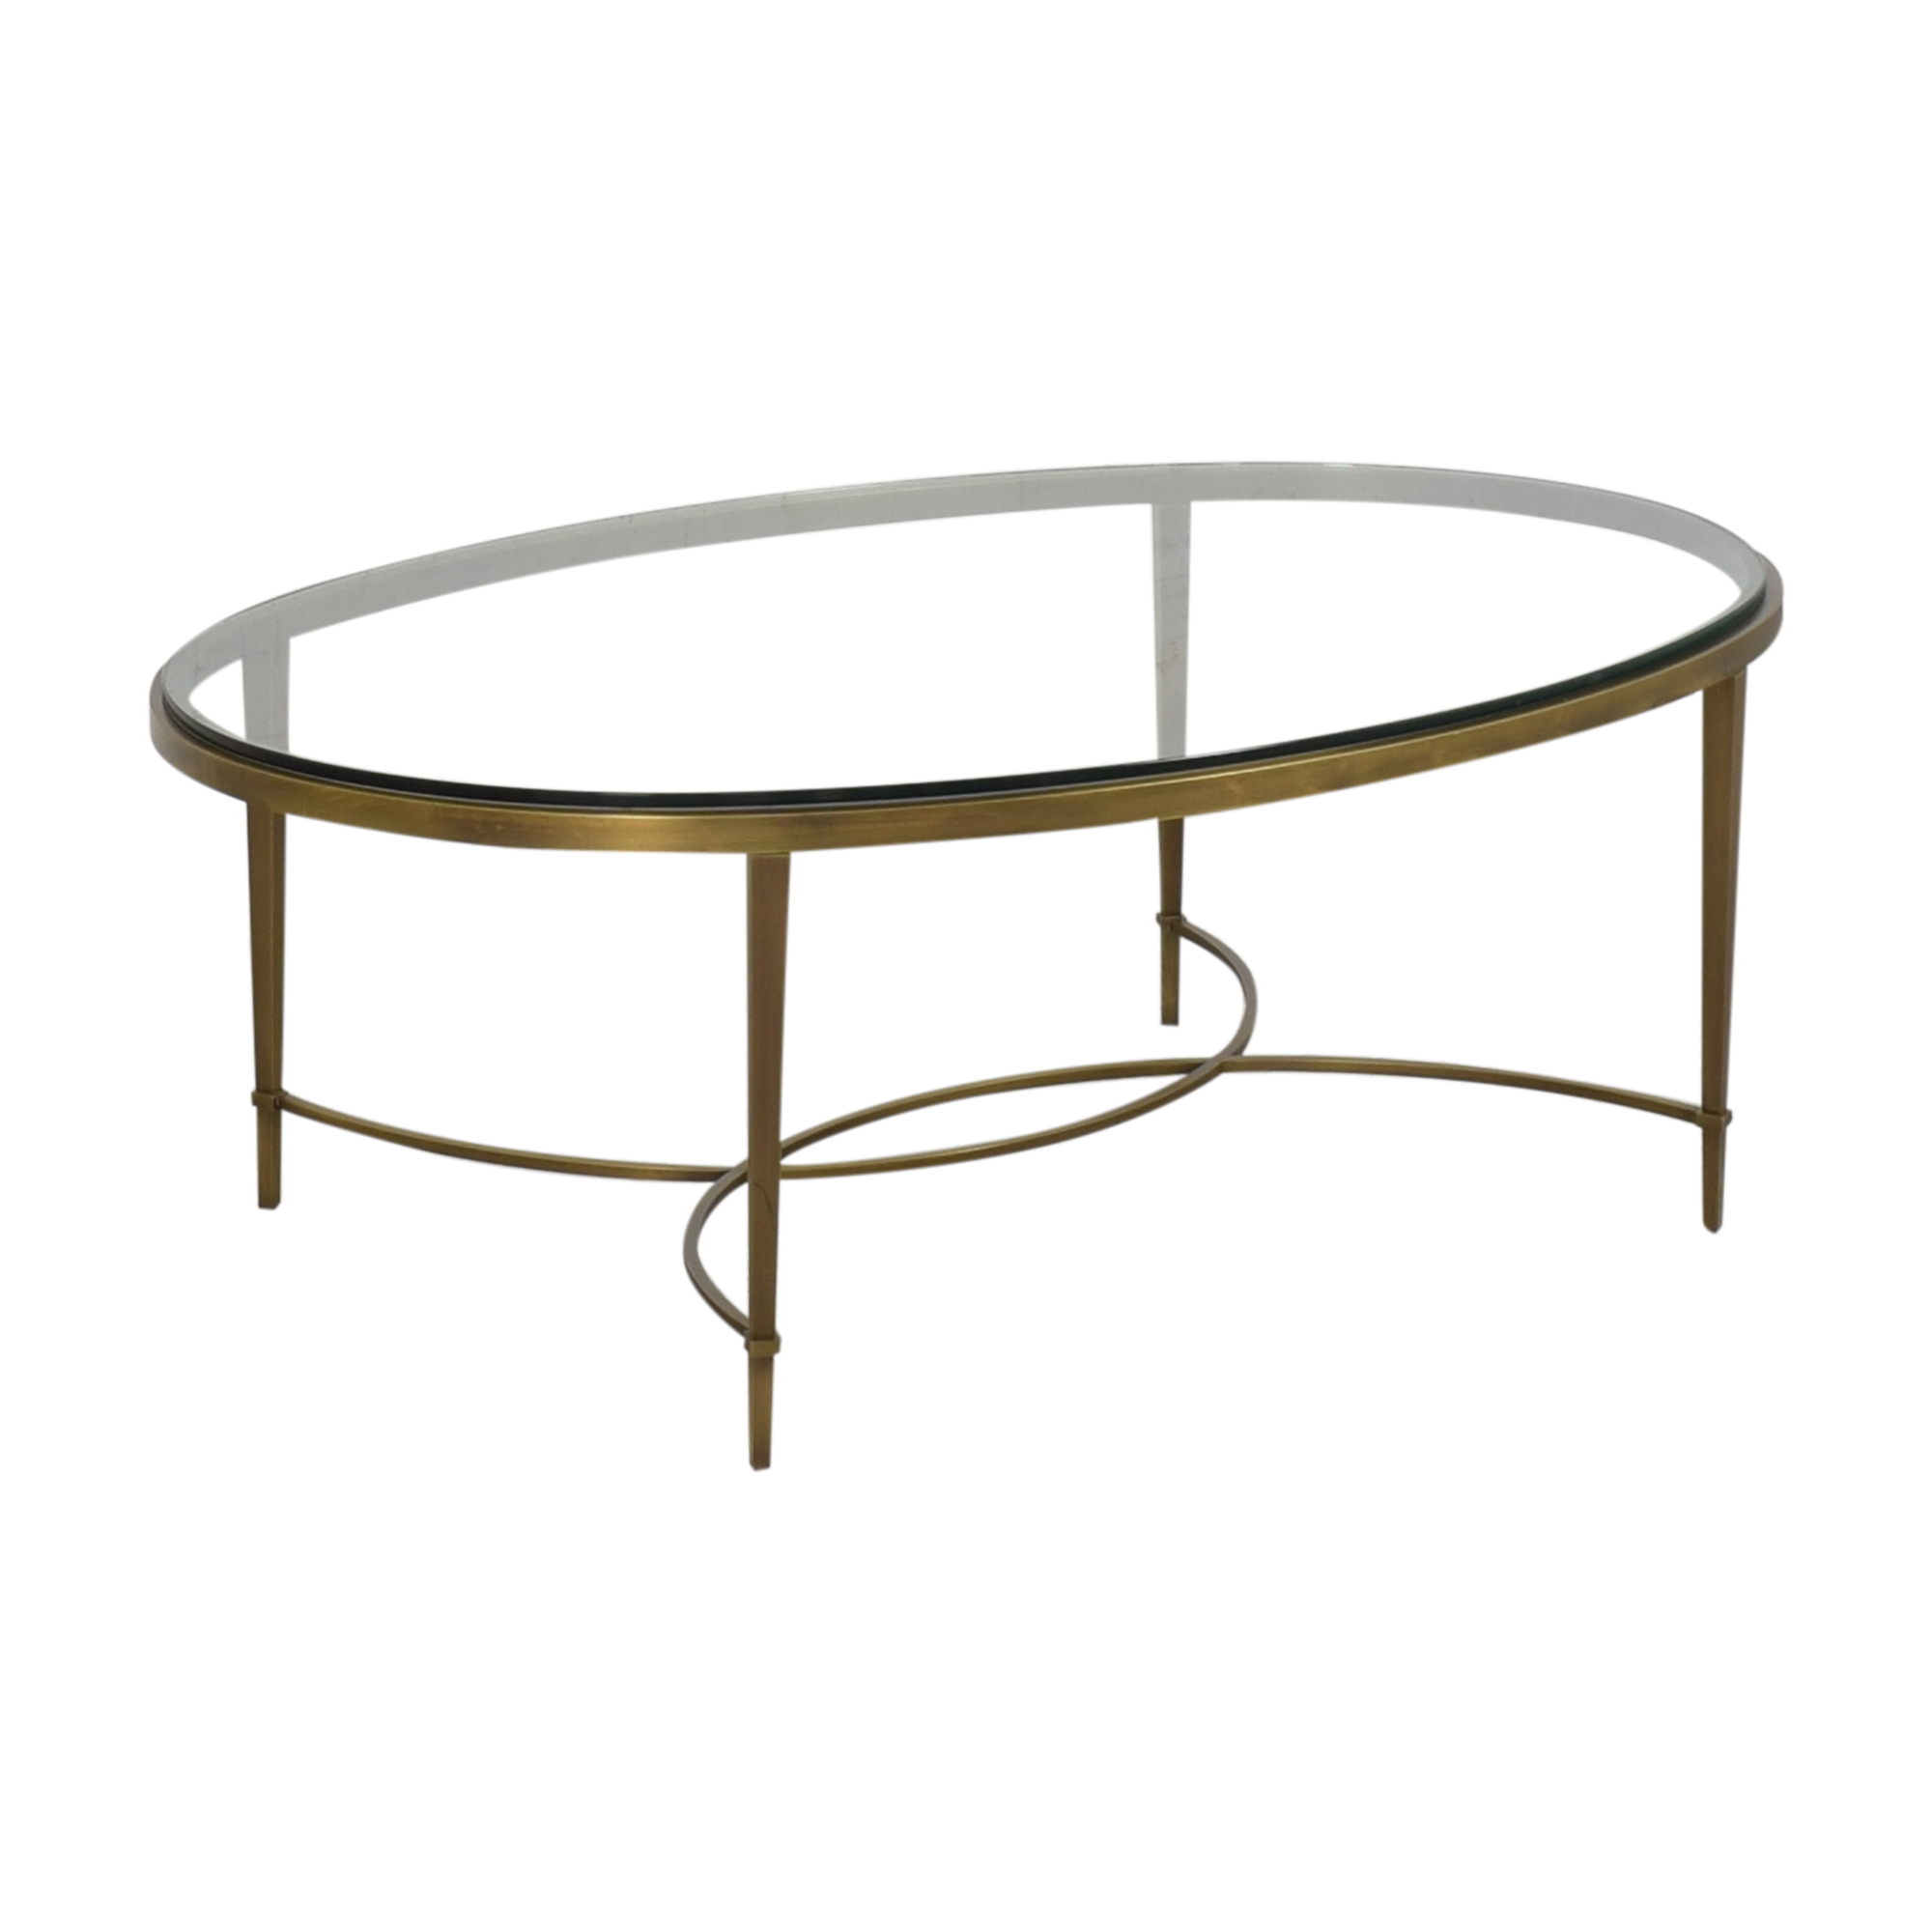 Baker Furniture Baker Furniture Oval Coffee Table gold